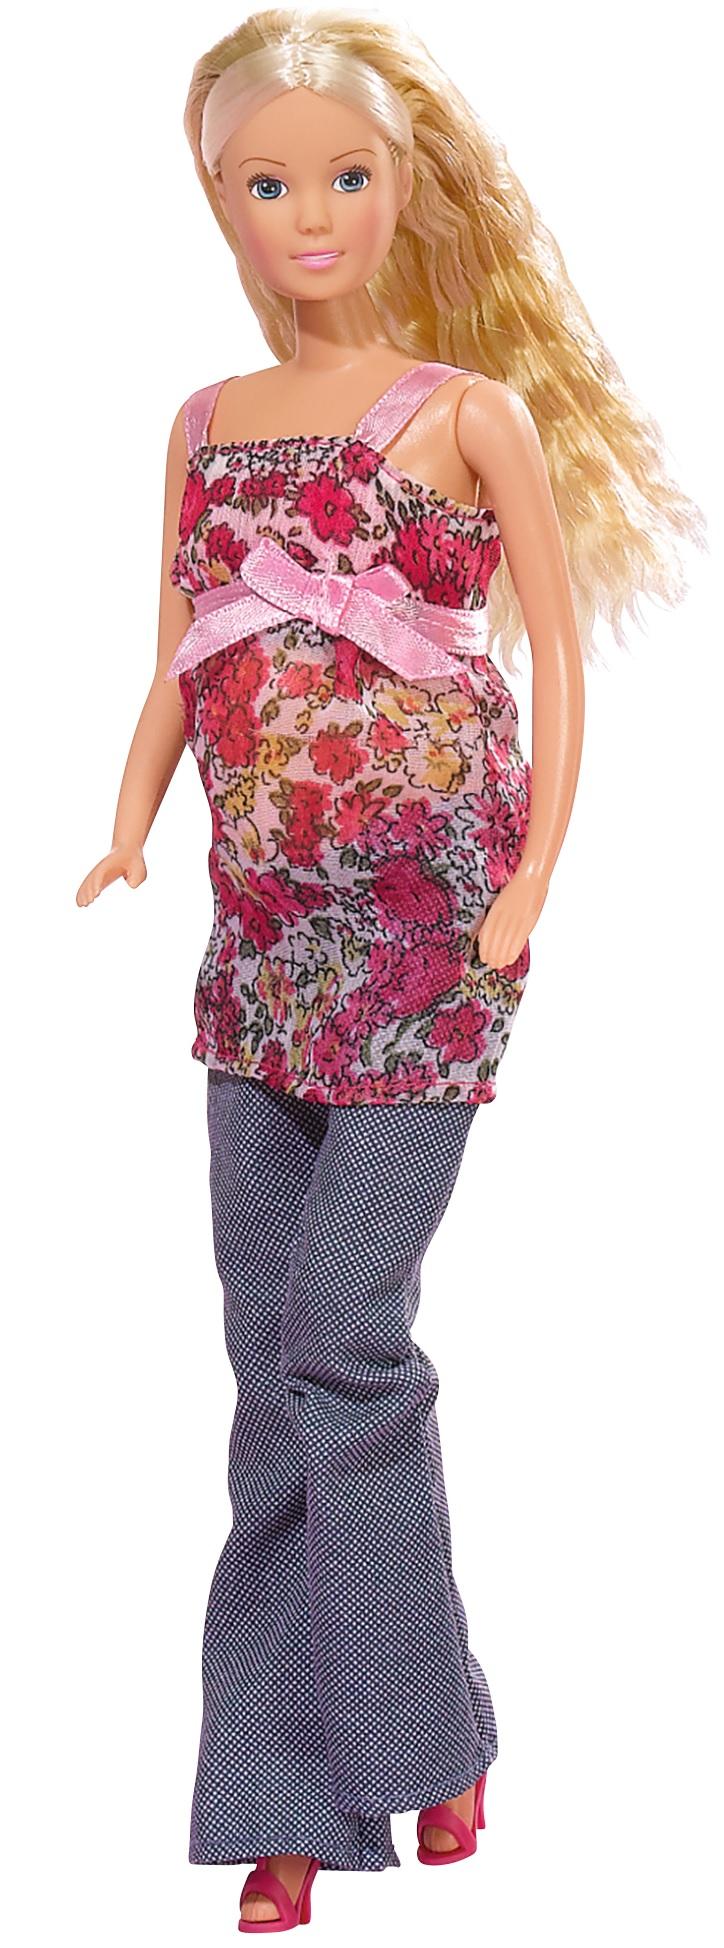 Кукла Штеффи беременная